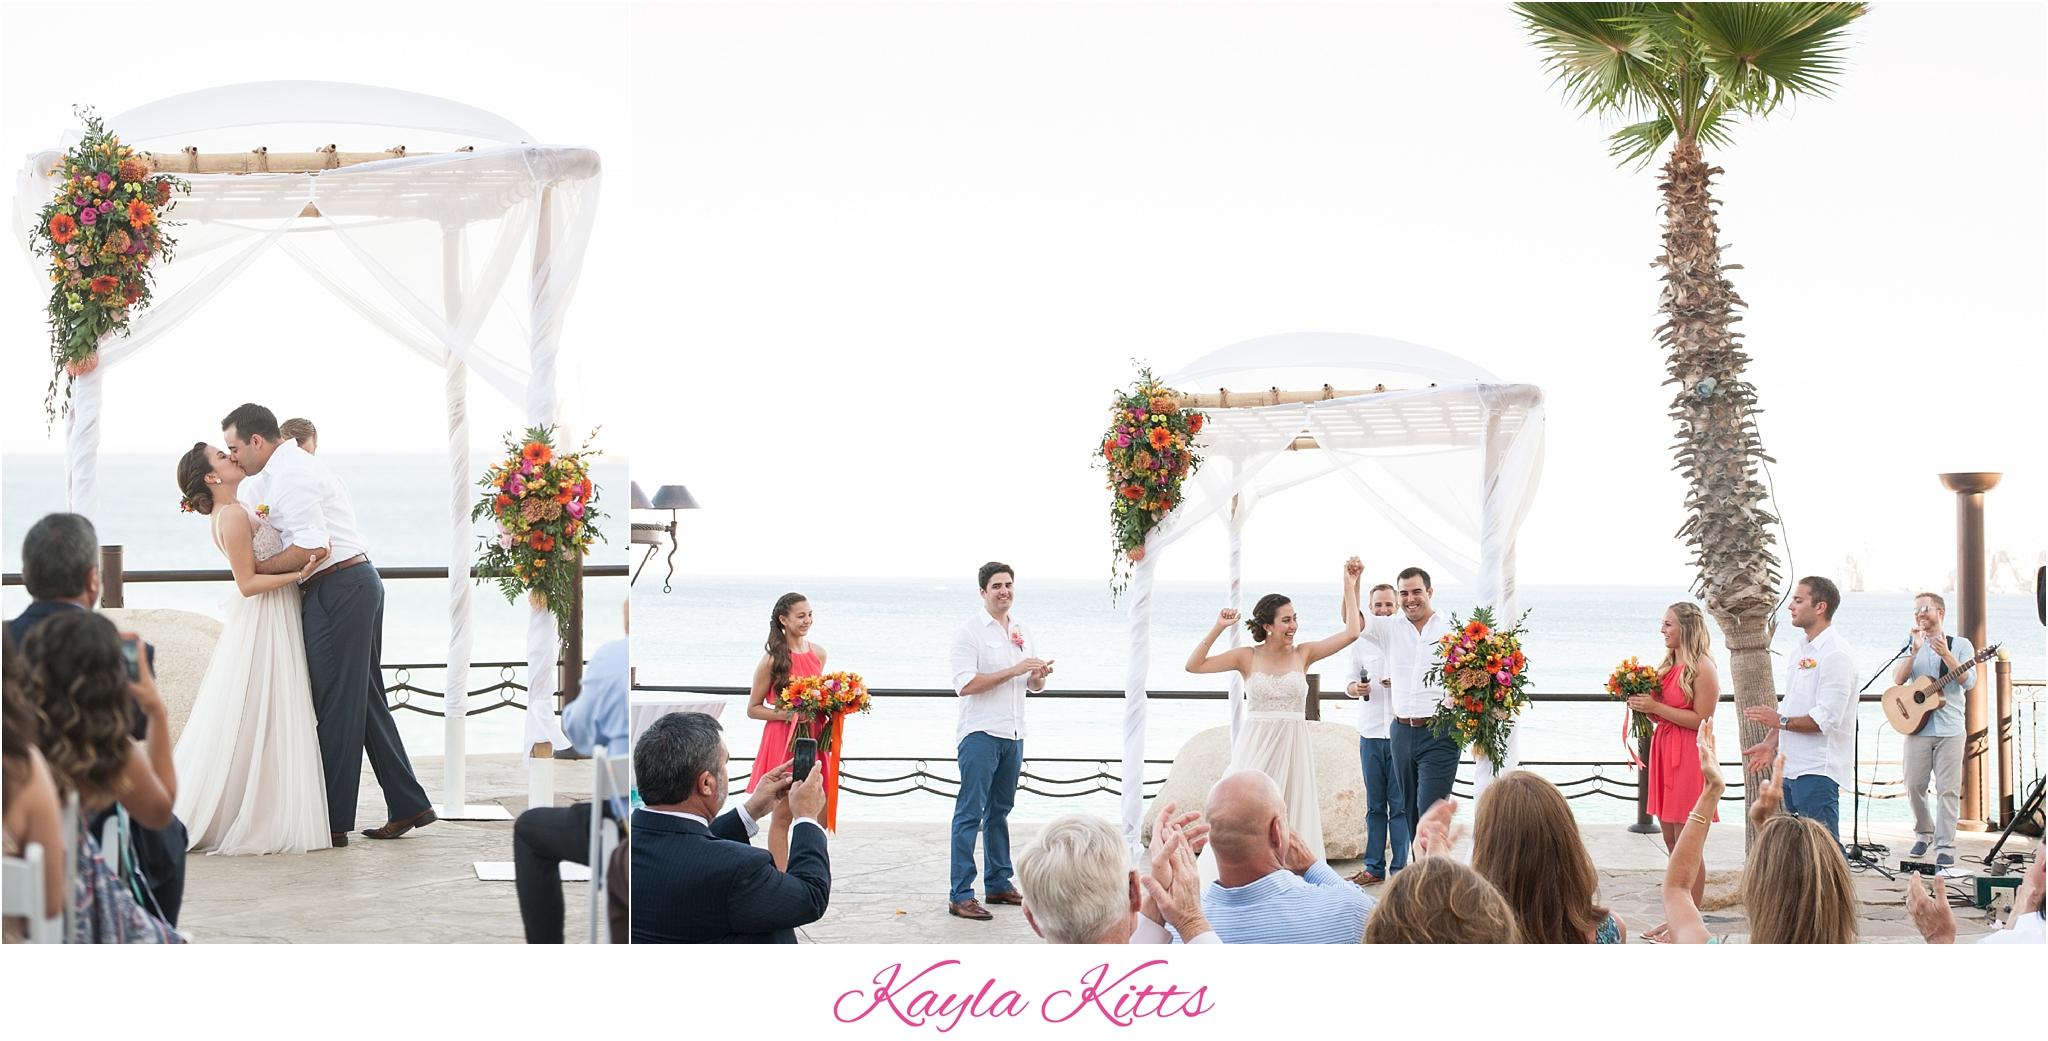 kayla kitts photography-travis and sarah-cabo wedding-cabo wedding photographer-destination wedding photographer-paris wedding photographer-albuquerque wedding-matt jones-albuquerque wedding vendor-intimate wedding_0018.jpg